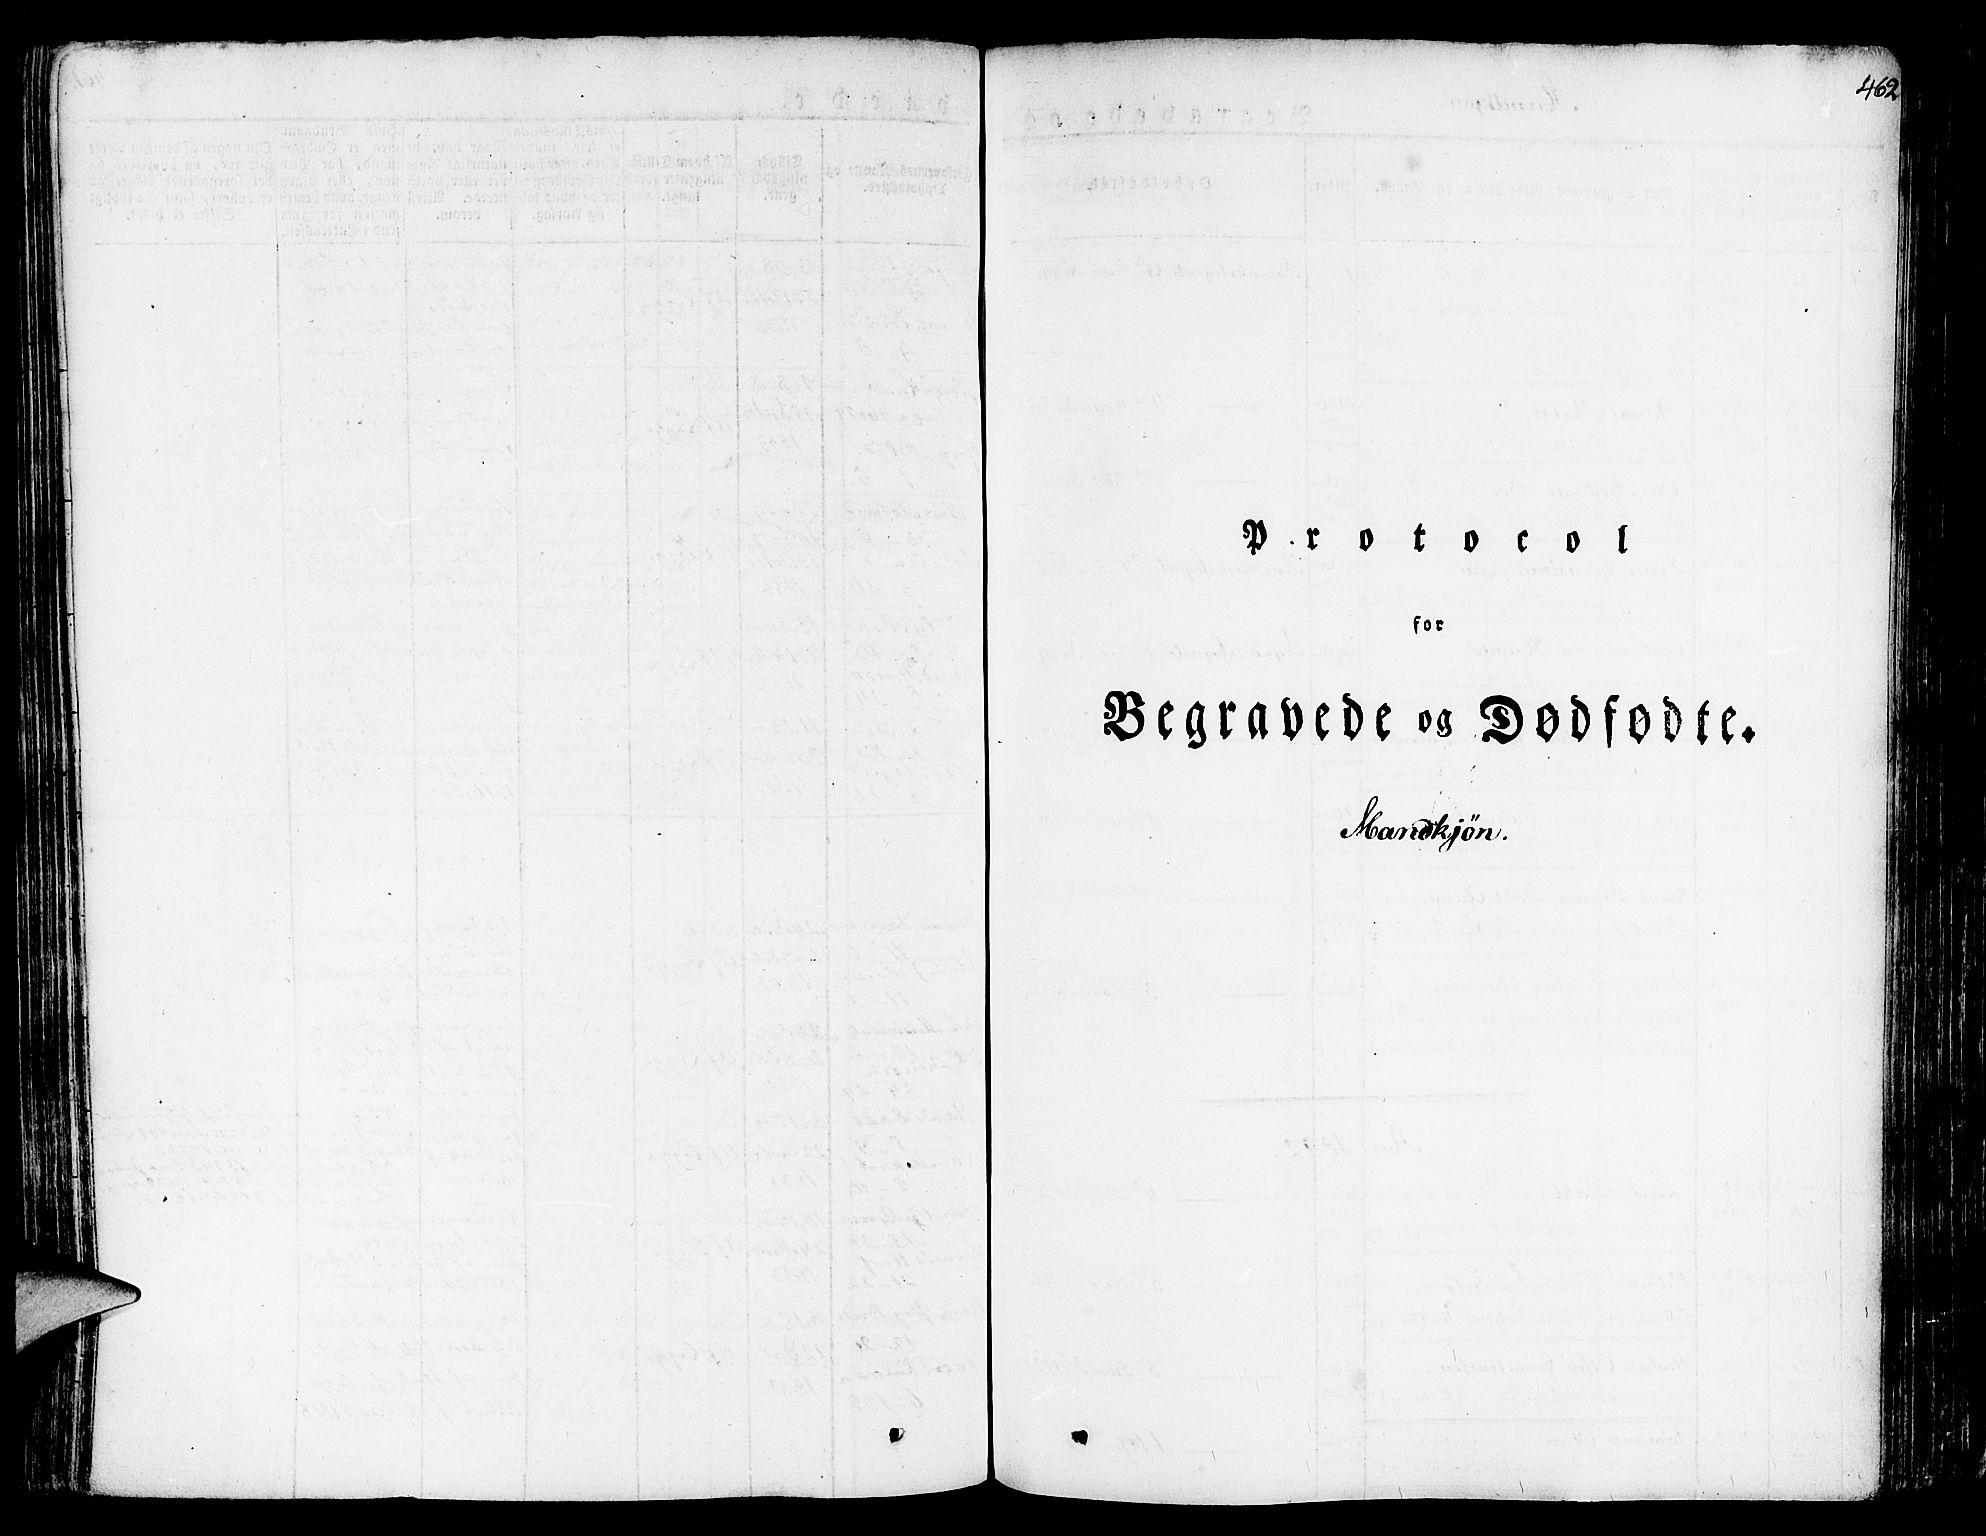 SAB, Nykirken Sokneprestembete, H/Haa: Ministerialbok nr. A 12, 1821-1844, s. 462